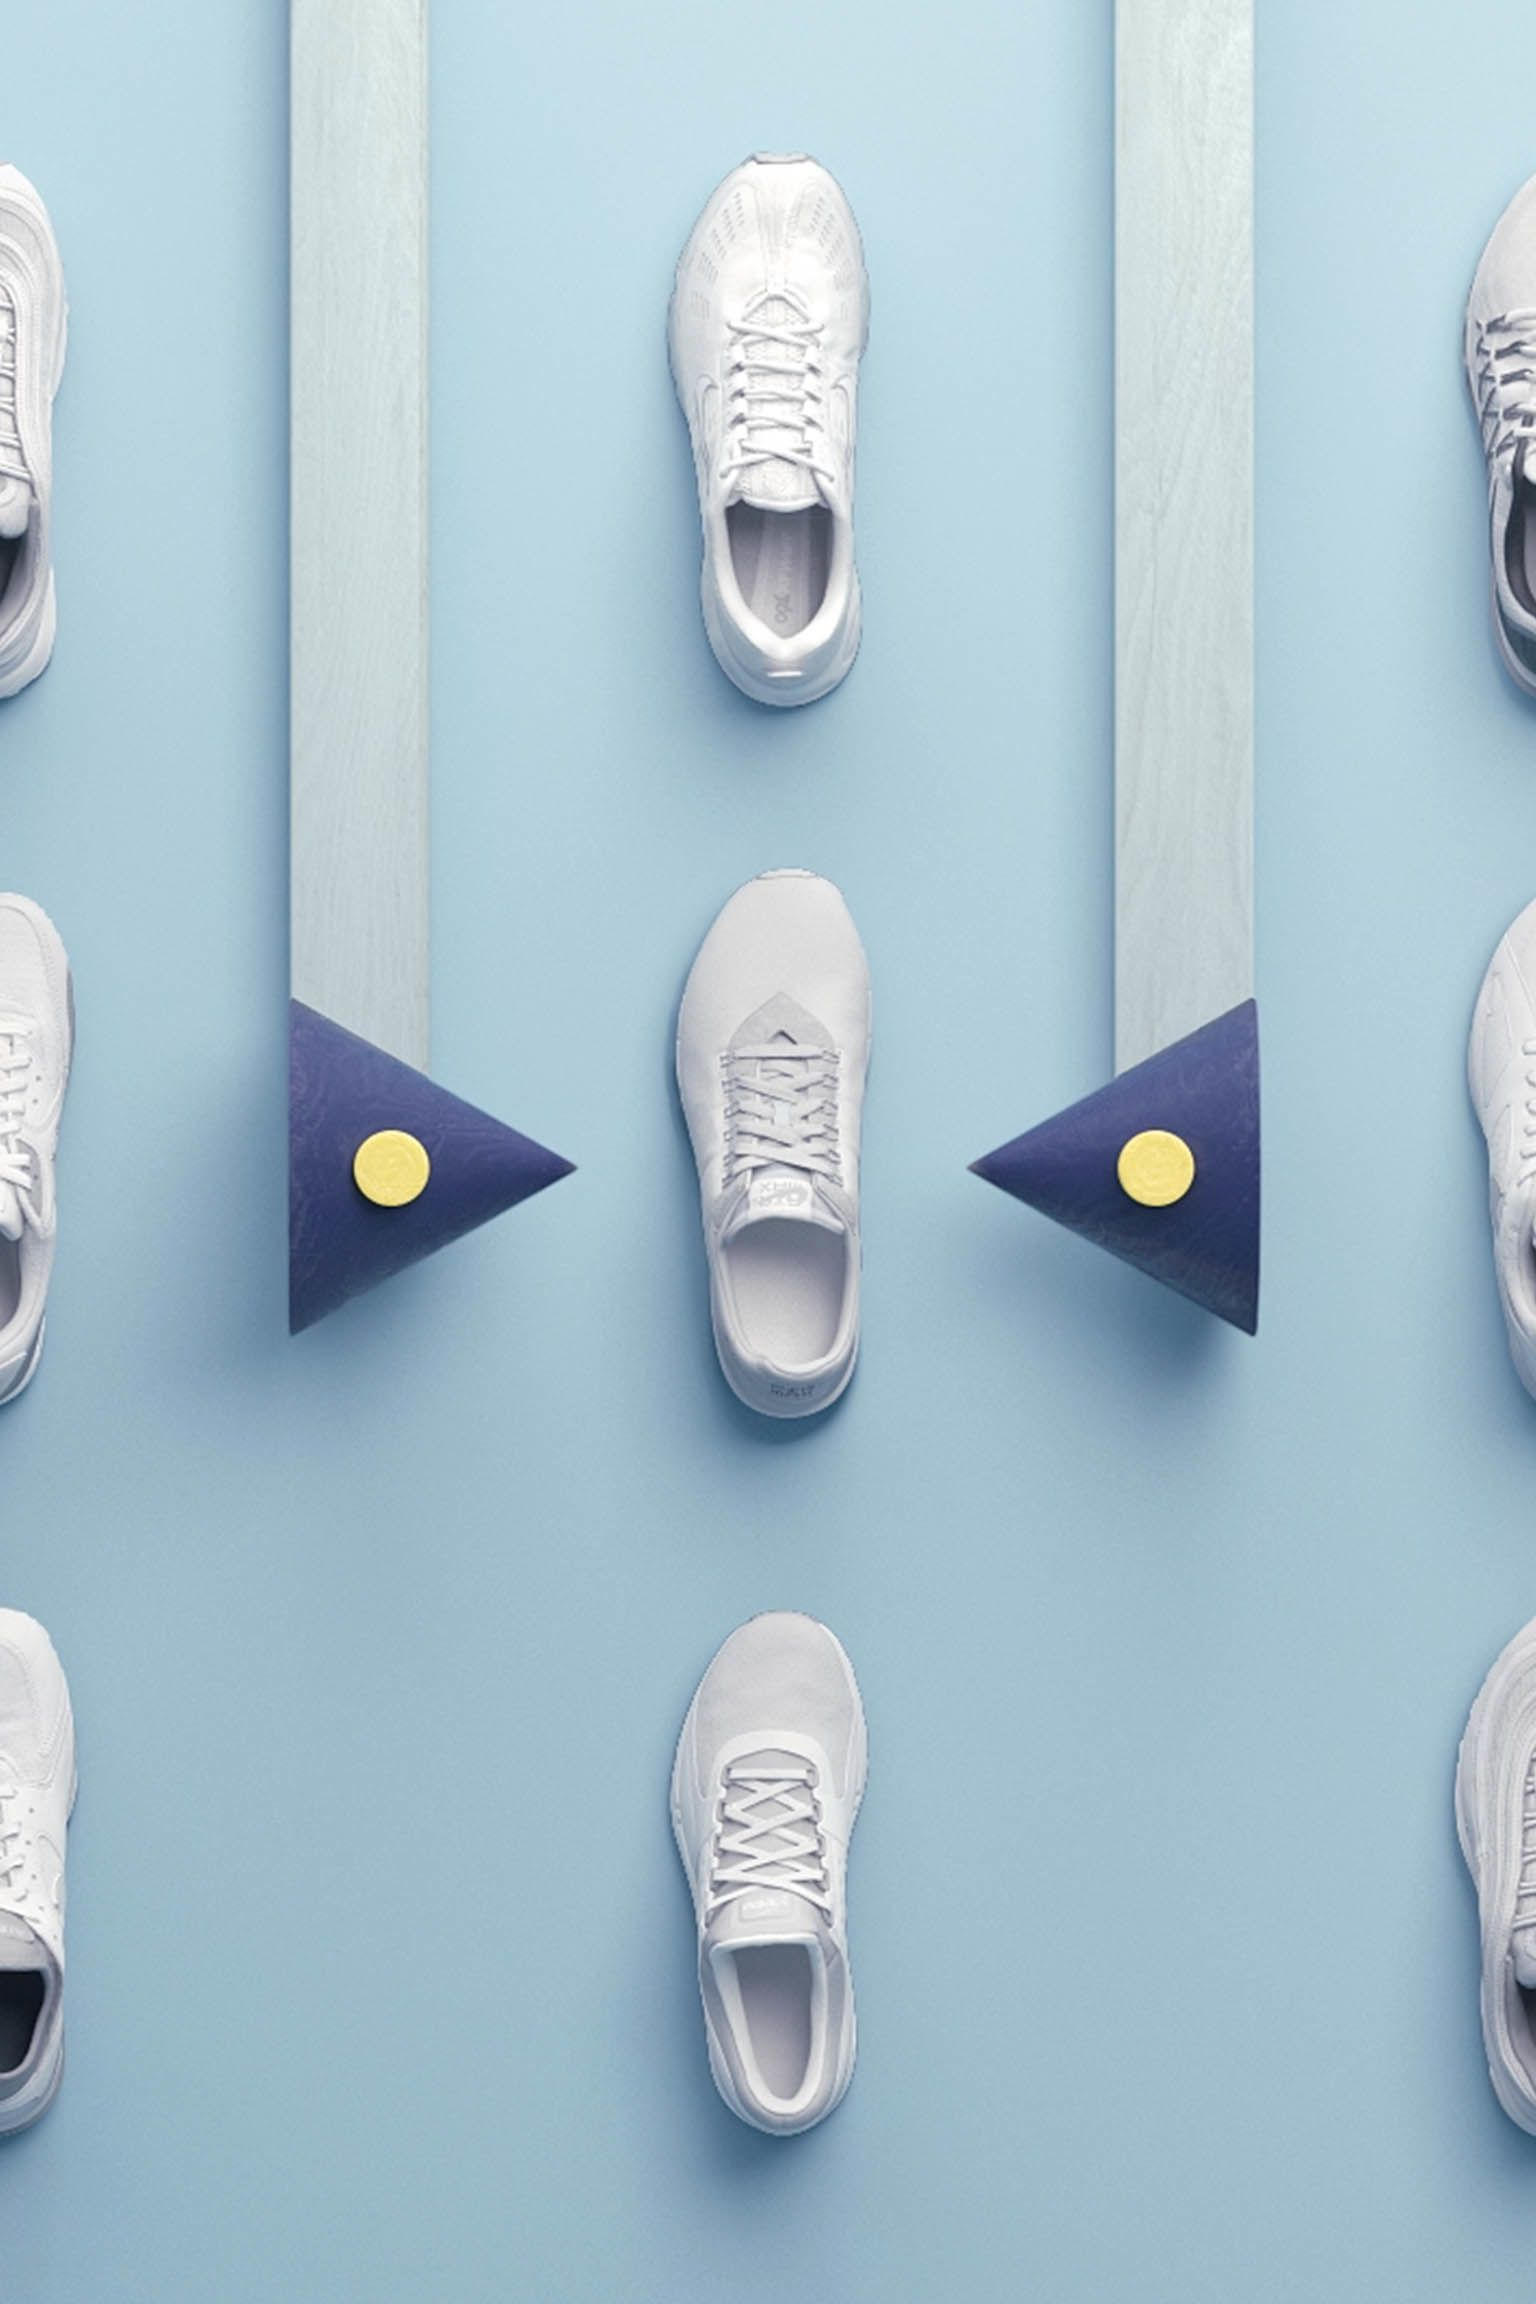 Nike Air Max LD-Zero H 'Hiroshi Fujiwara'